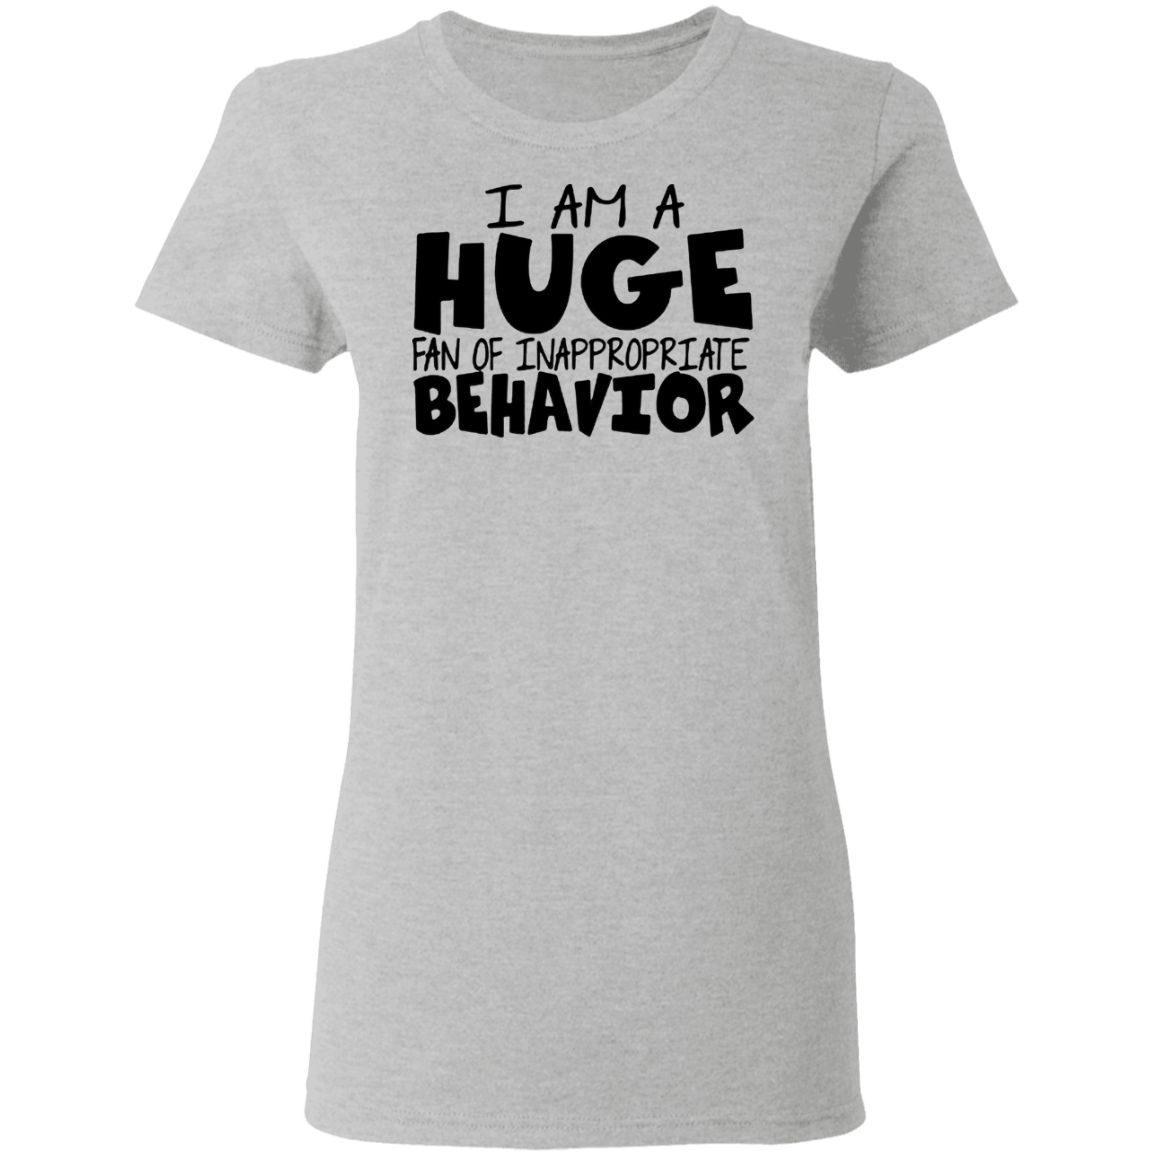 I Am A Huge Fan Of Inappropriate Behavior T-Shirt